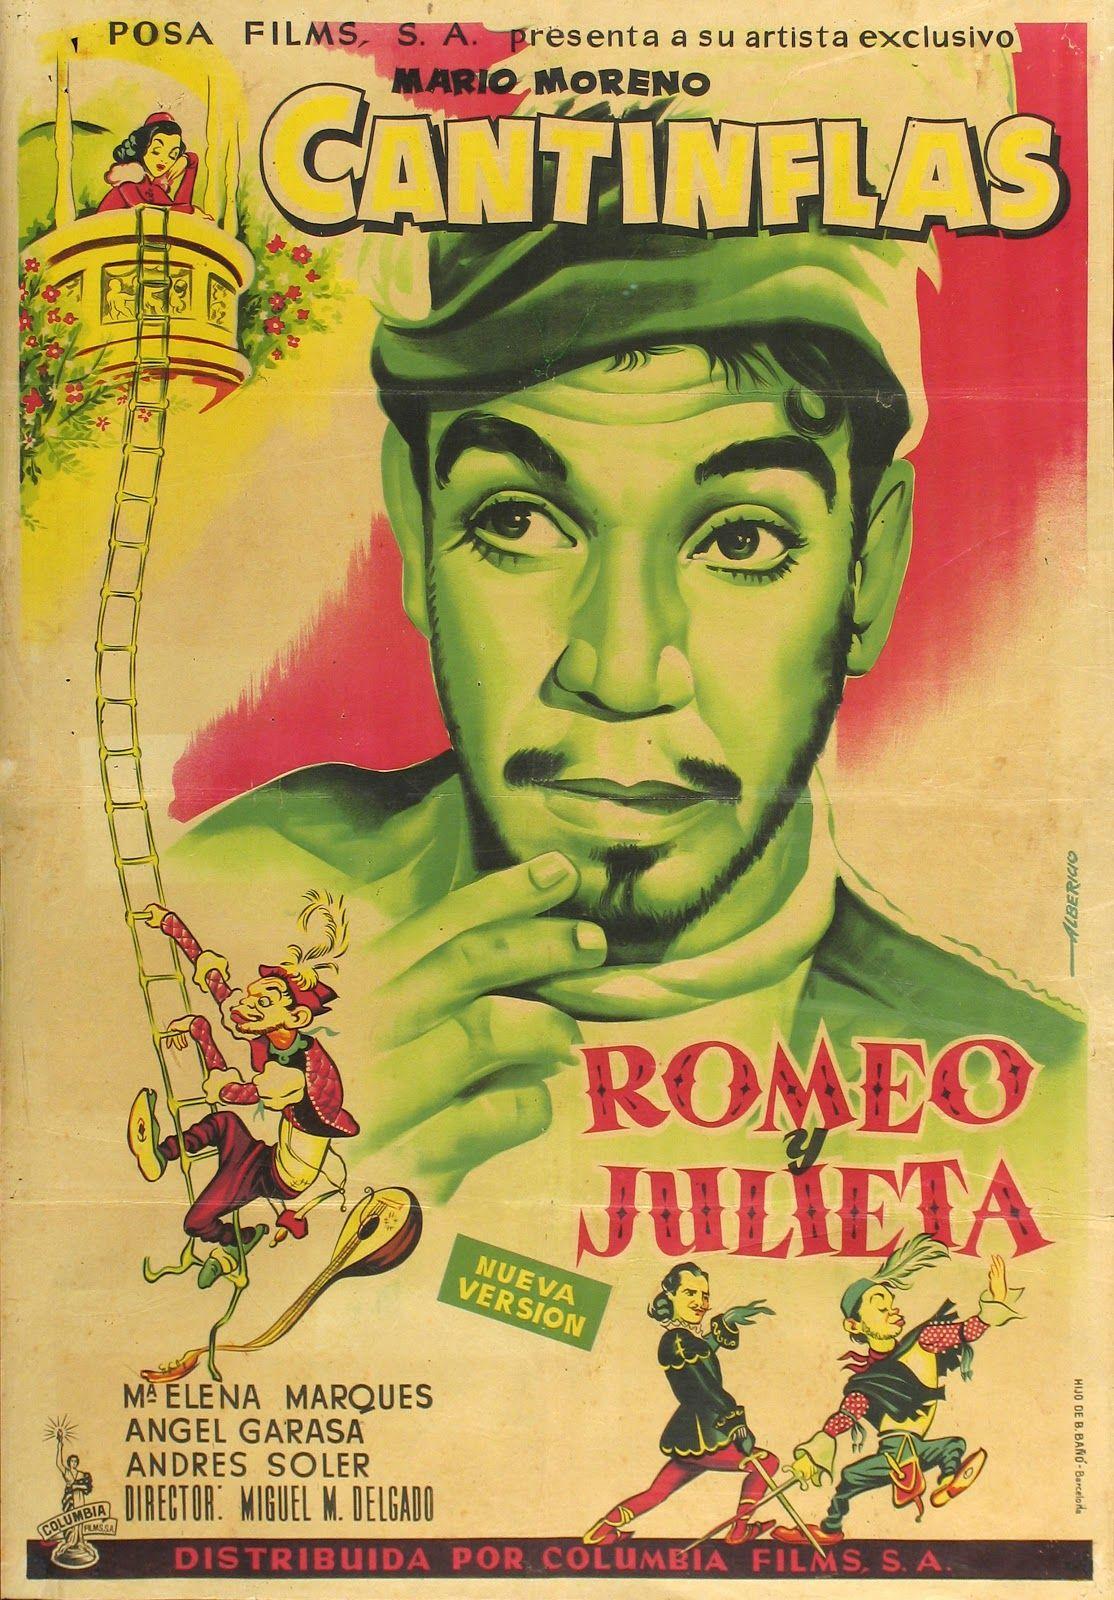 Cantinflas Movie Posters Best Movie Posters Movie Posters Vintage